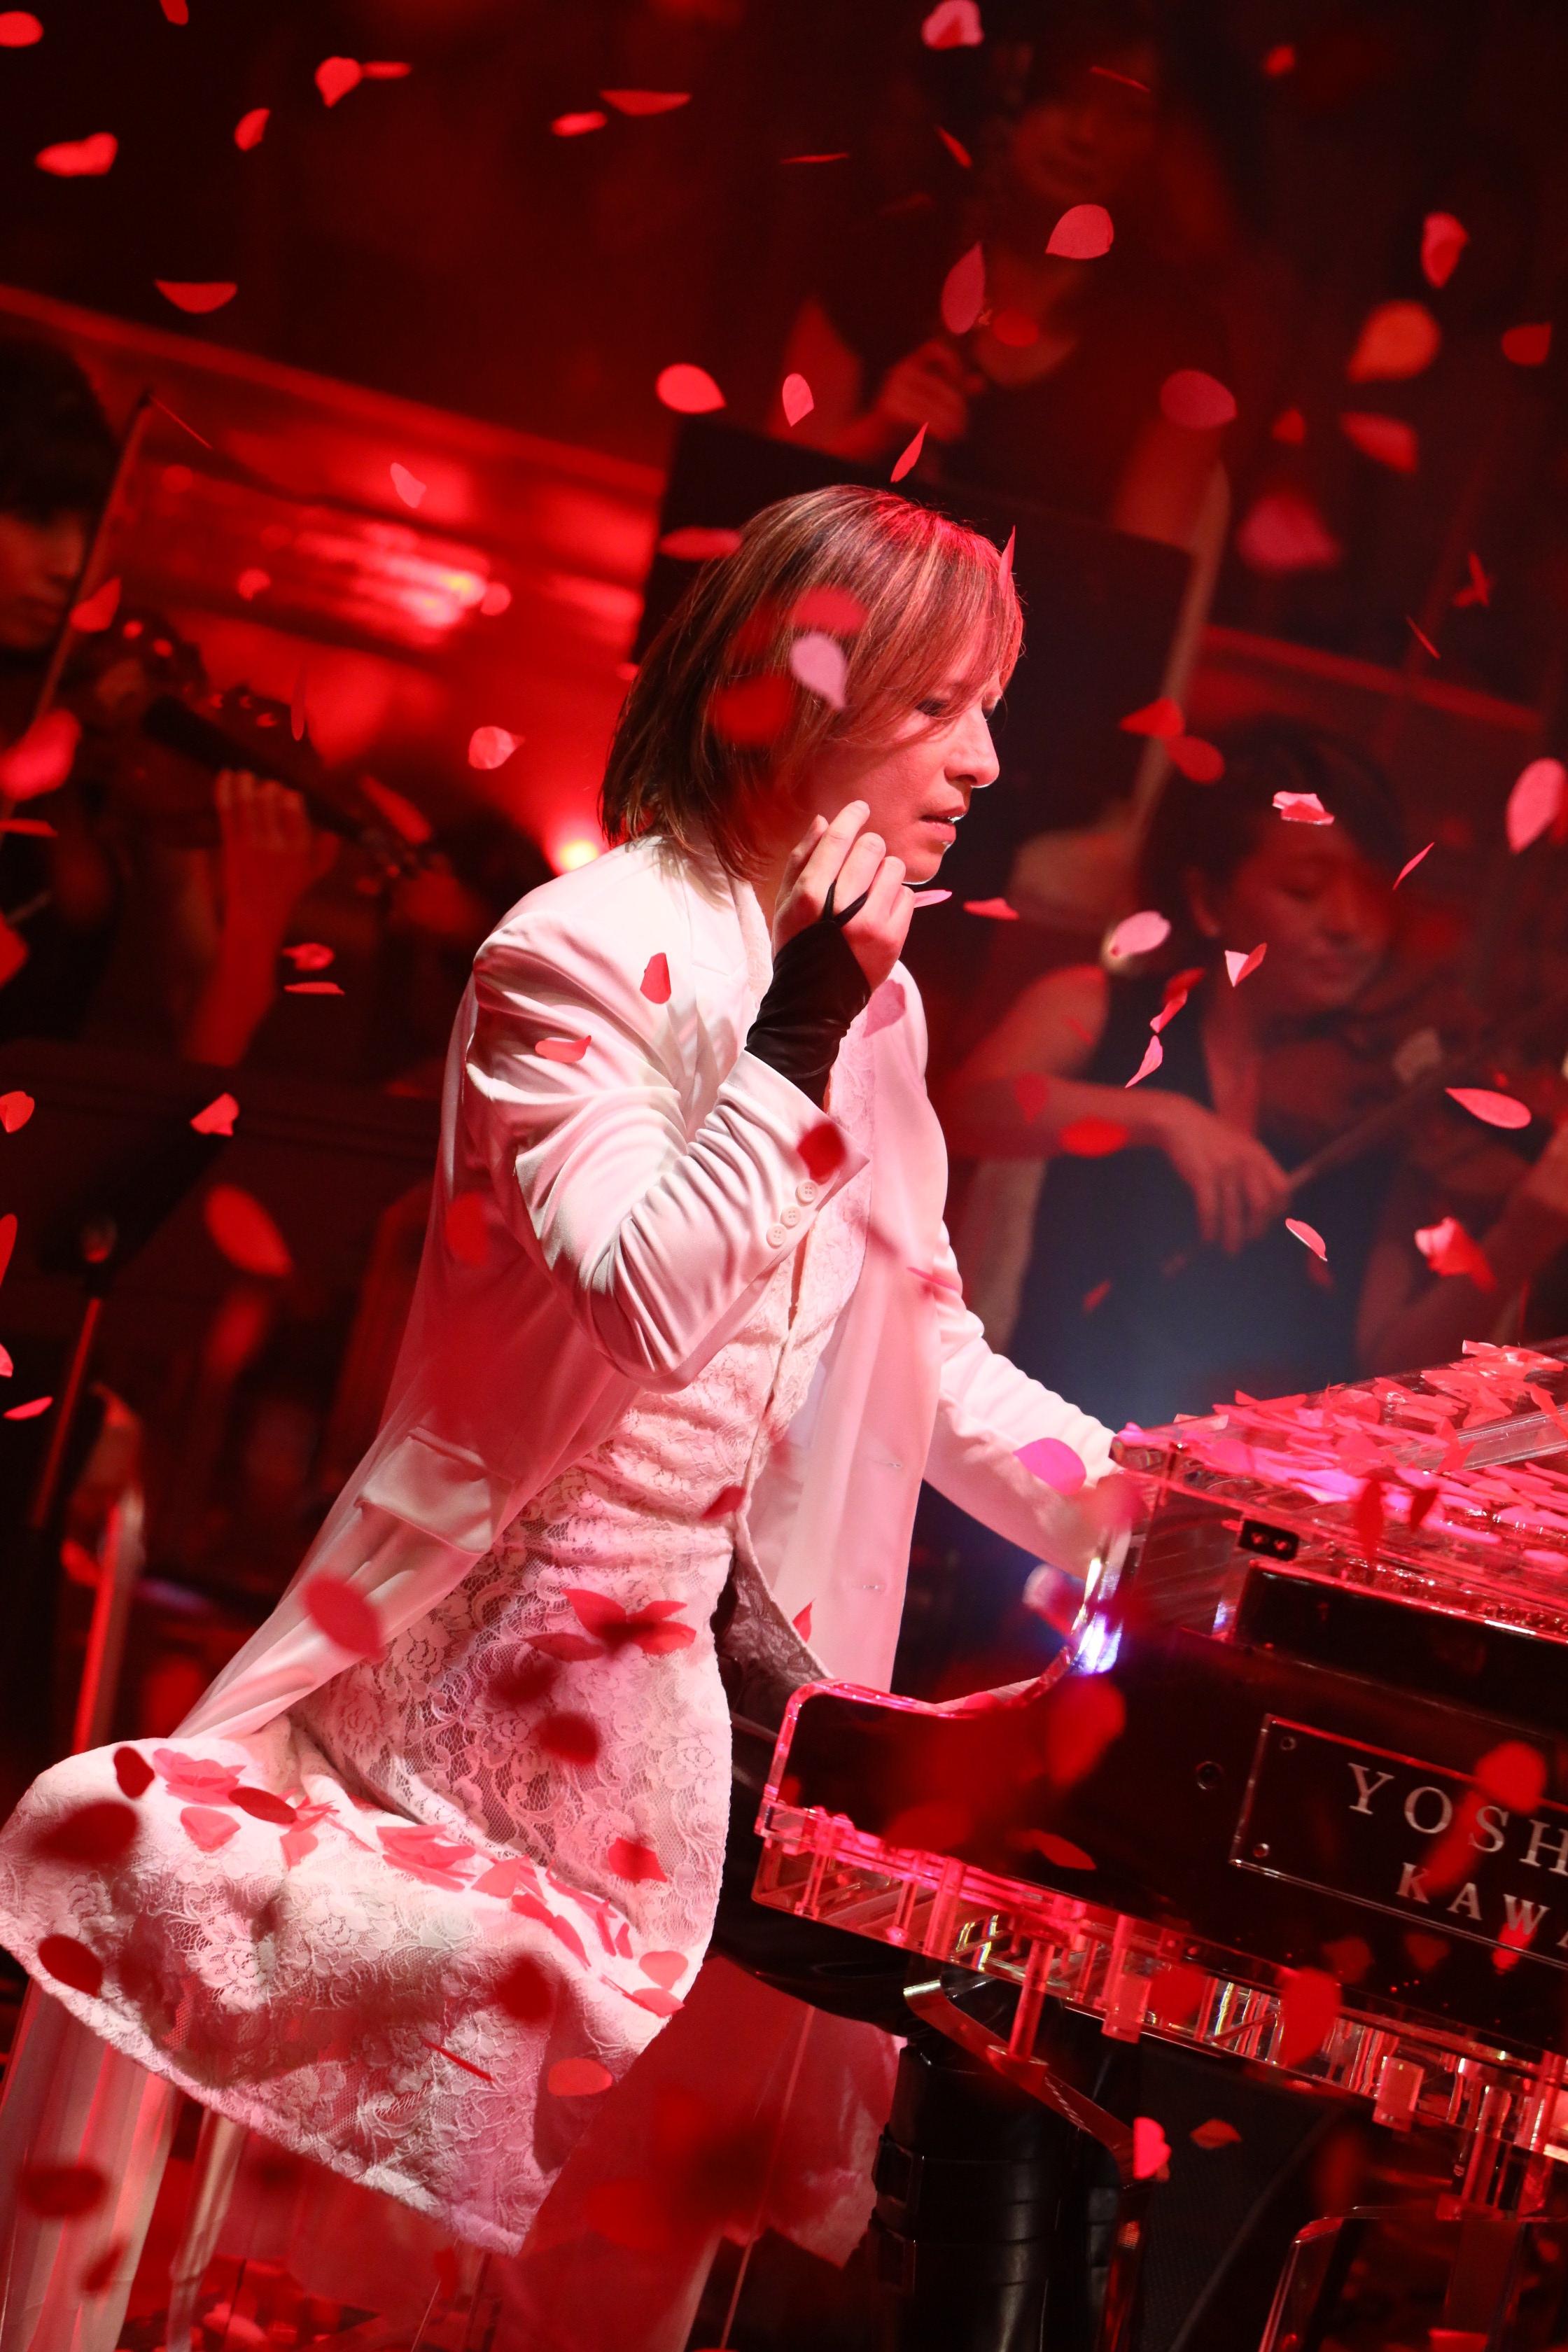 RMMS-Yoshiki-Music-Station-20170918-0141